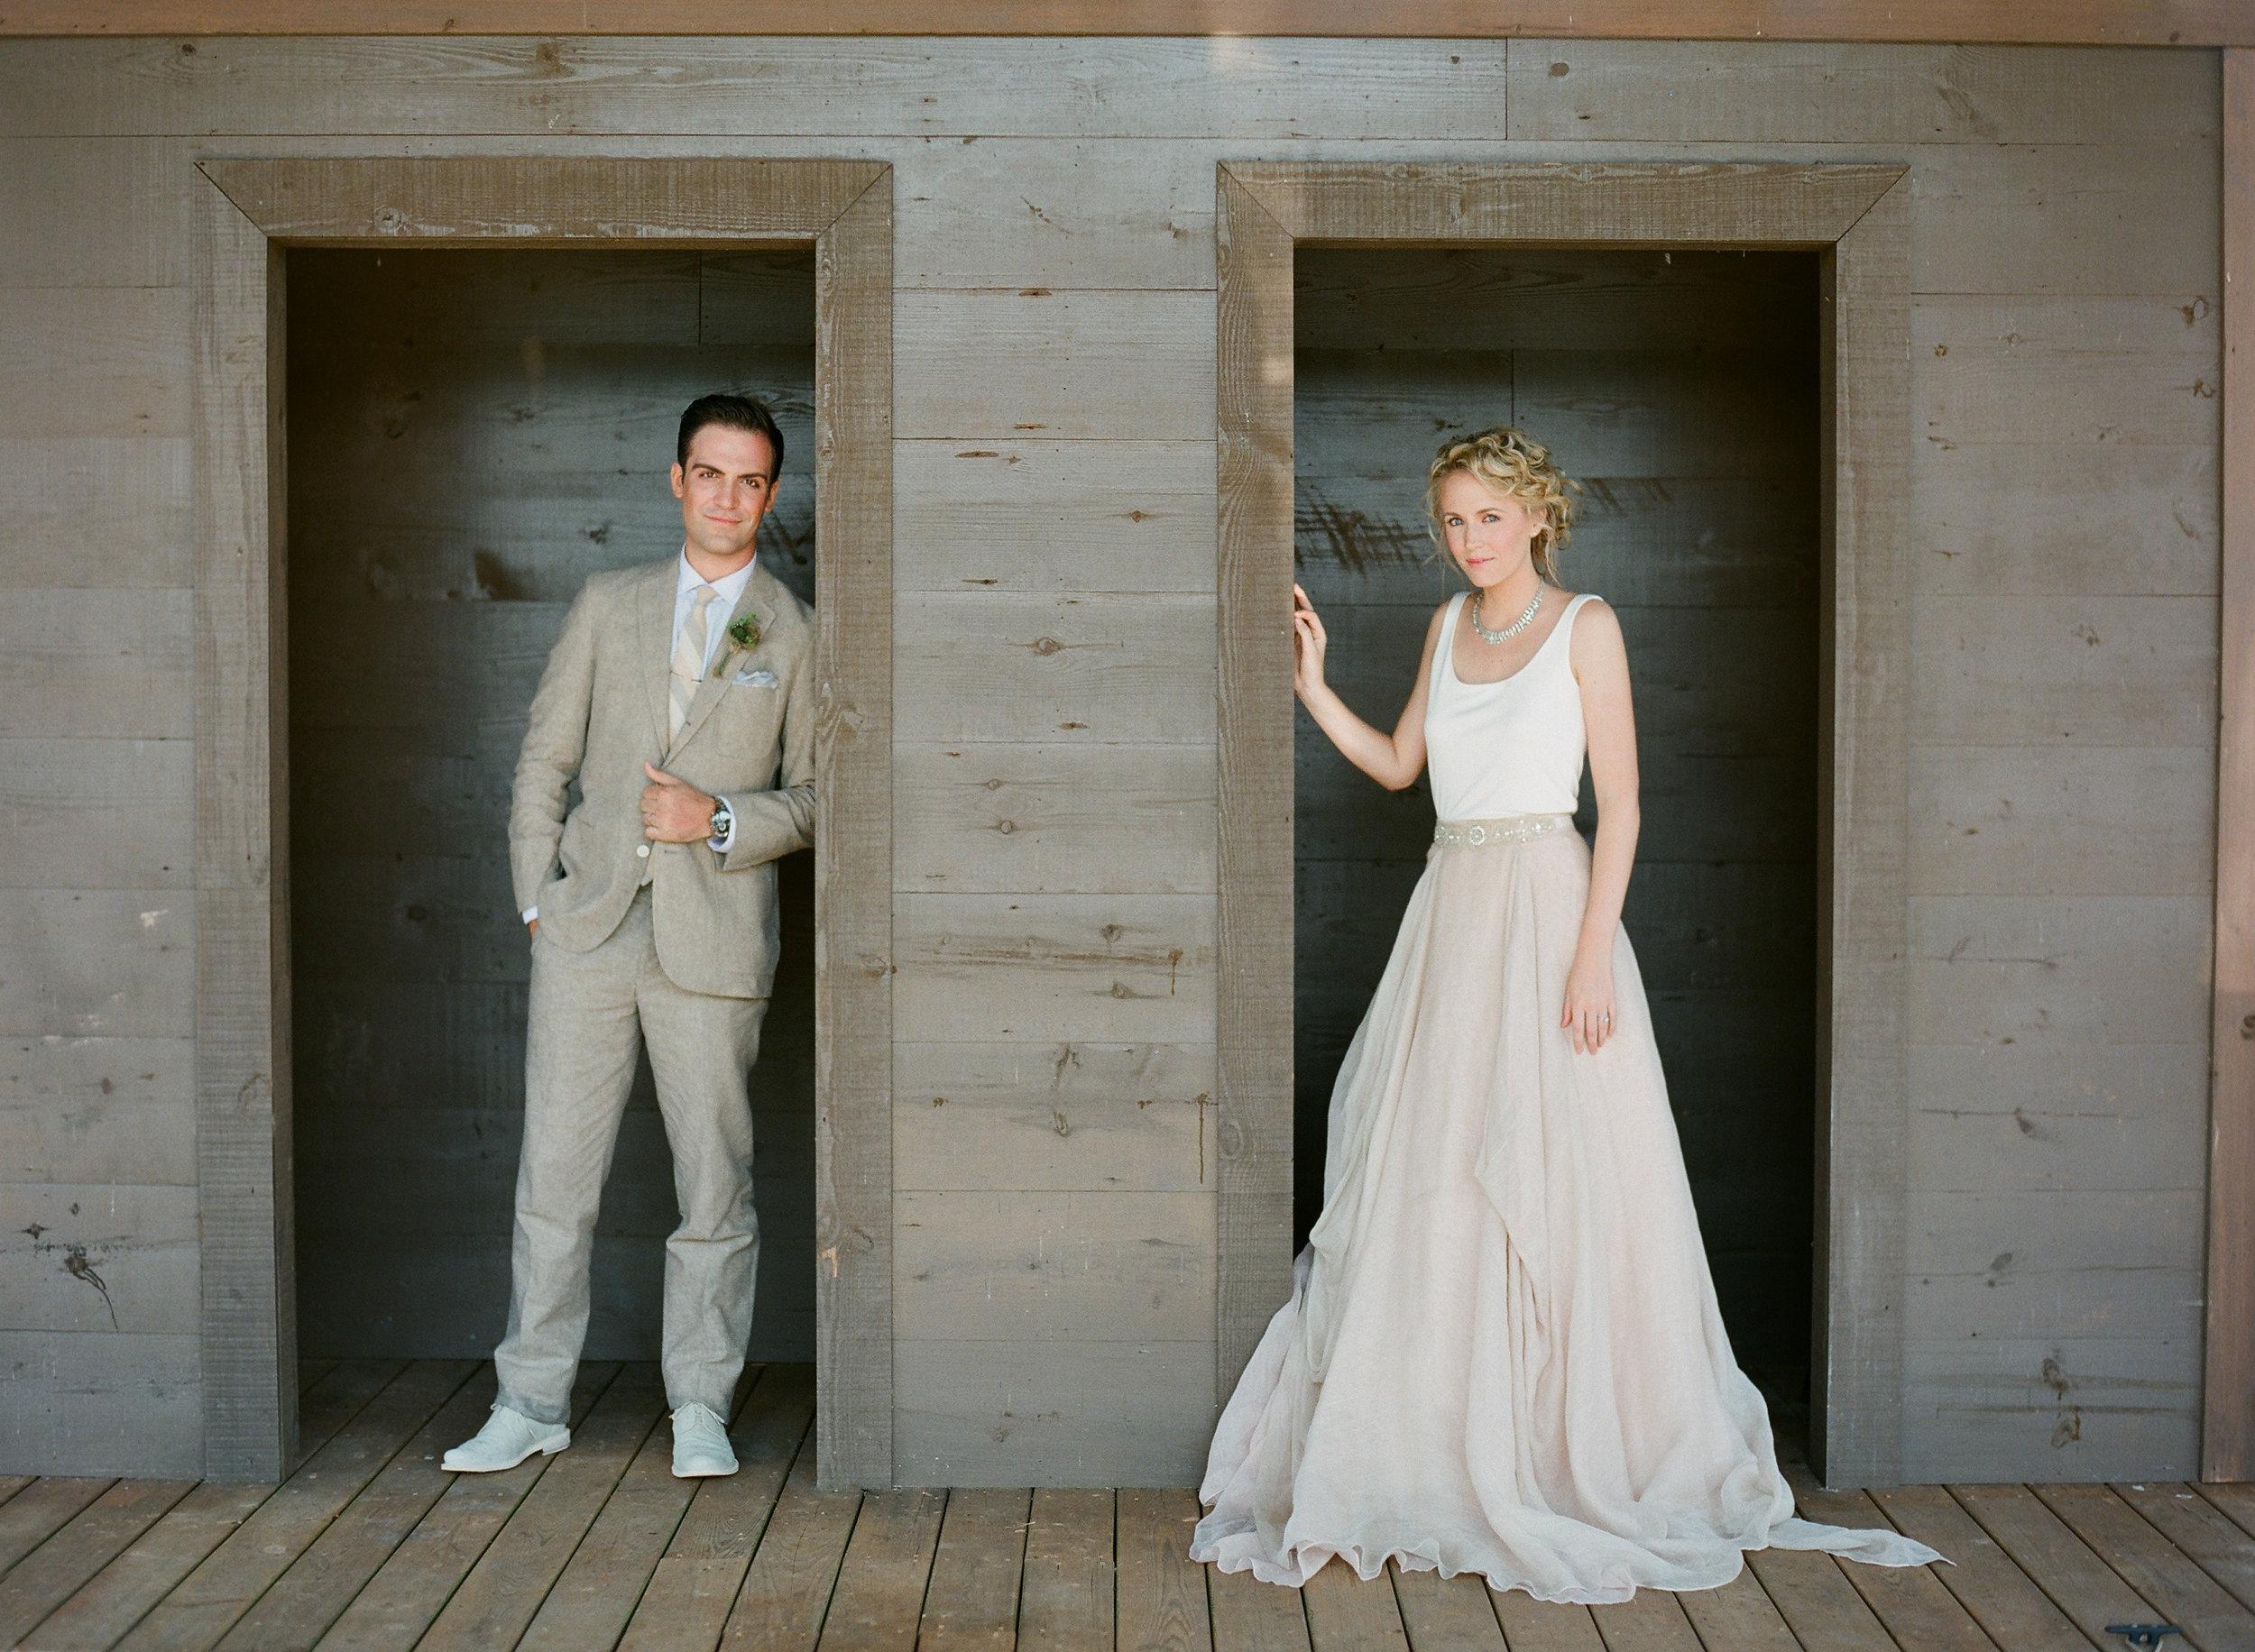 Simply-Charming-Socials_Atlanta-Wedding-Planner_Styled-Photo-Shoot_Modern-Luxury-Brides_Buffy-Dekmar-Photography_Ginny-Branch_Foxhall-Sporting-Club_19.jpg